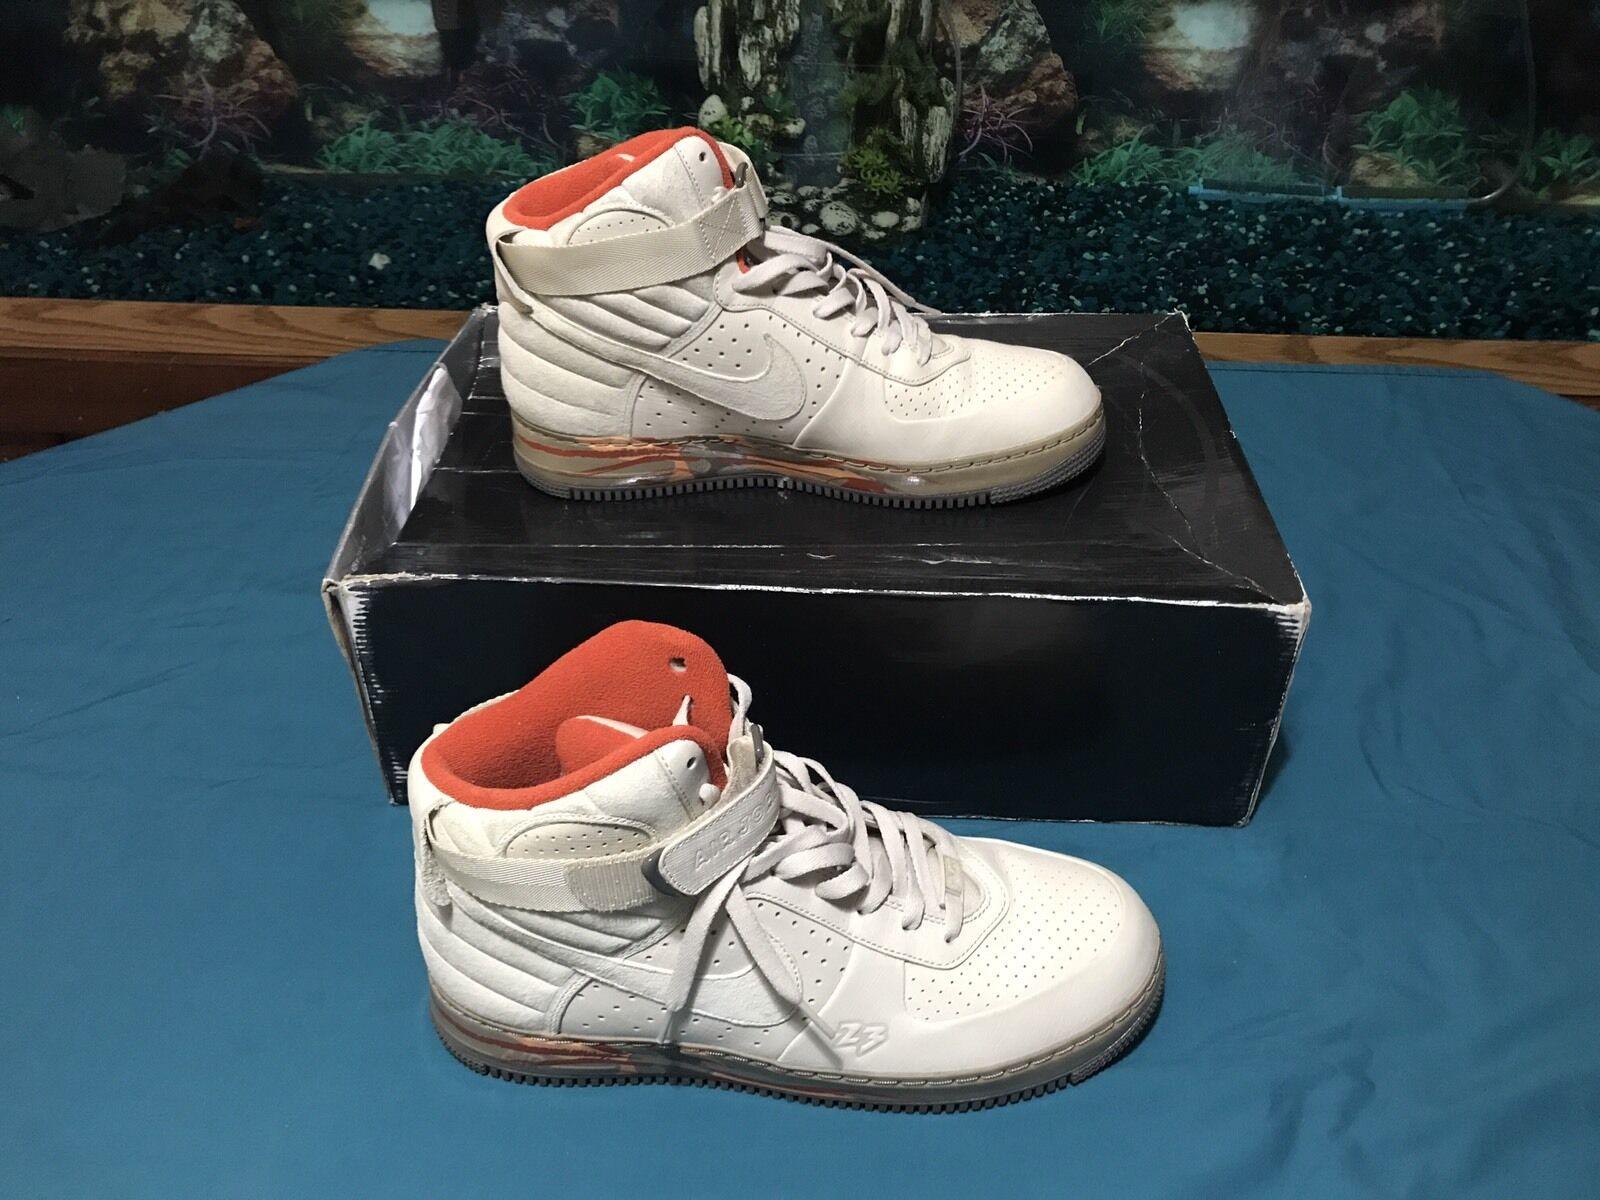 Nike Size Men's AJF 8 LS Size Nike 12 HTF d7e3a8